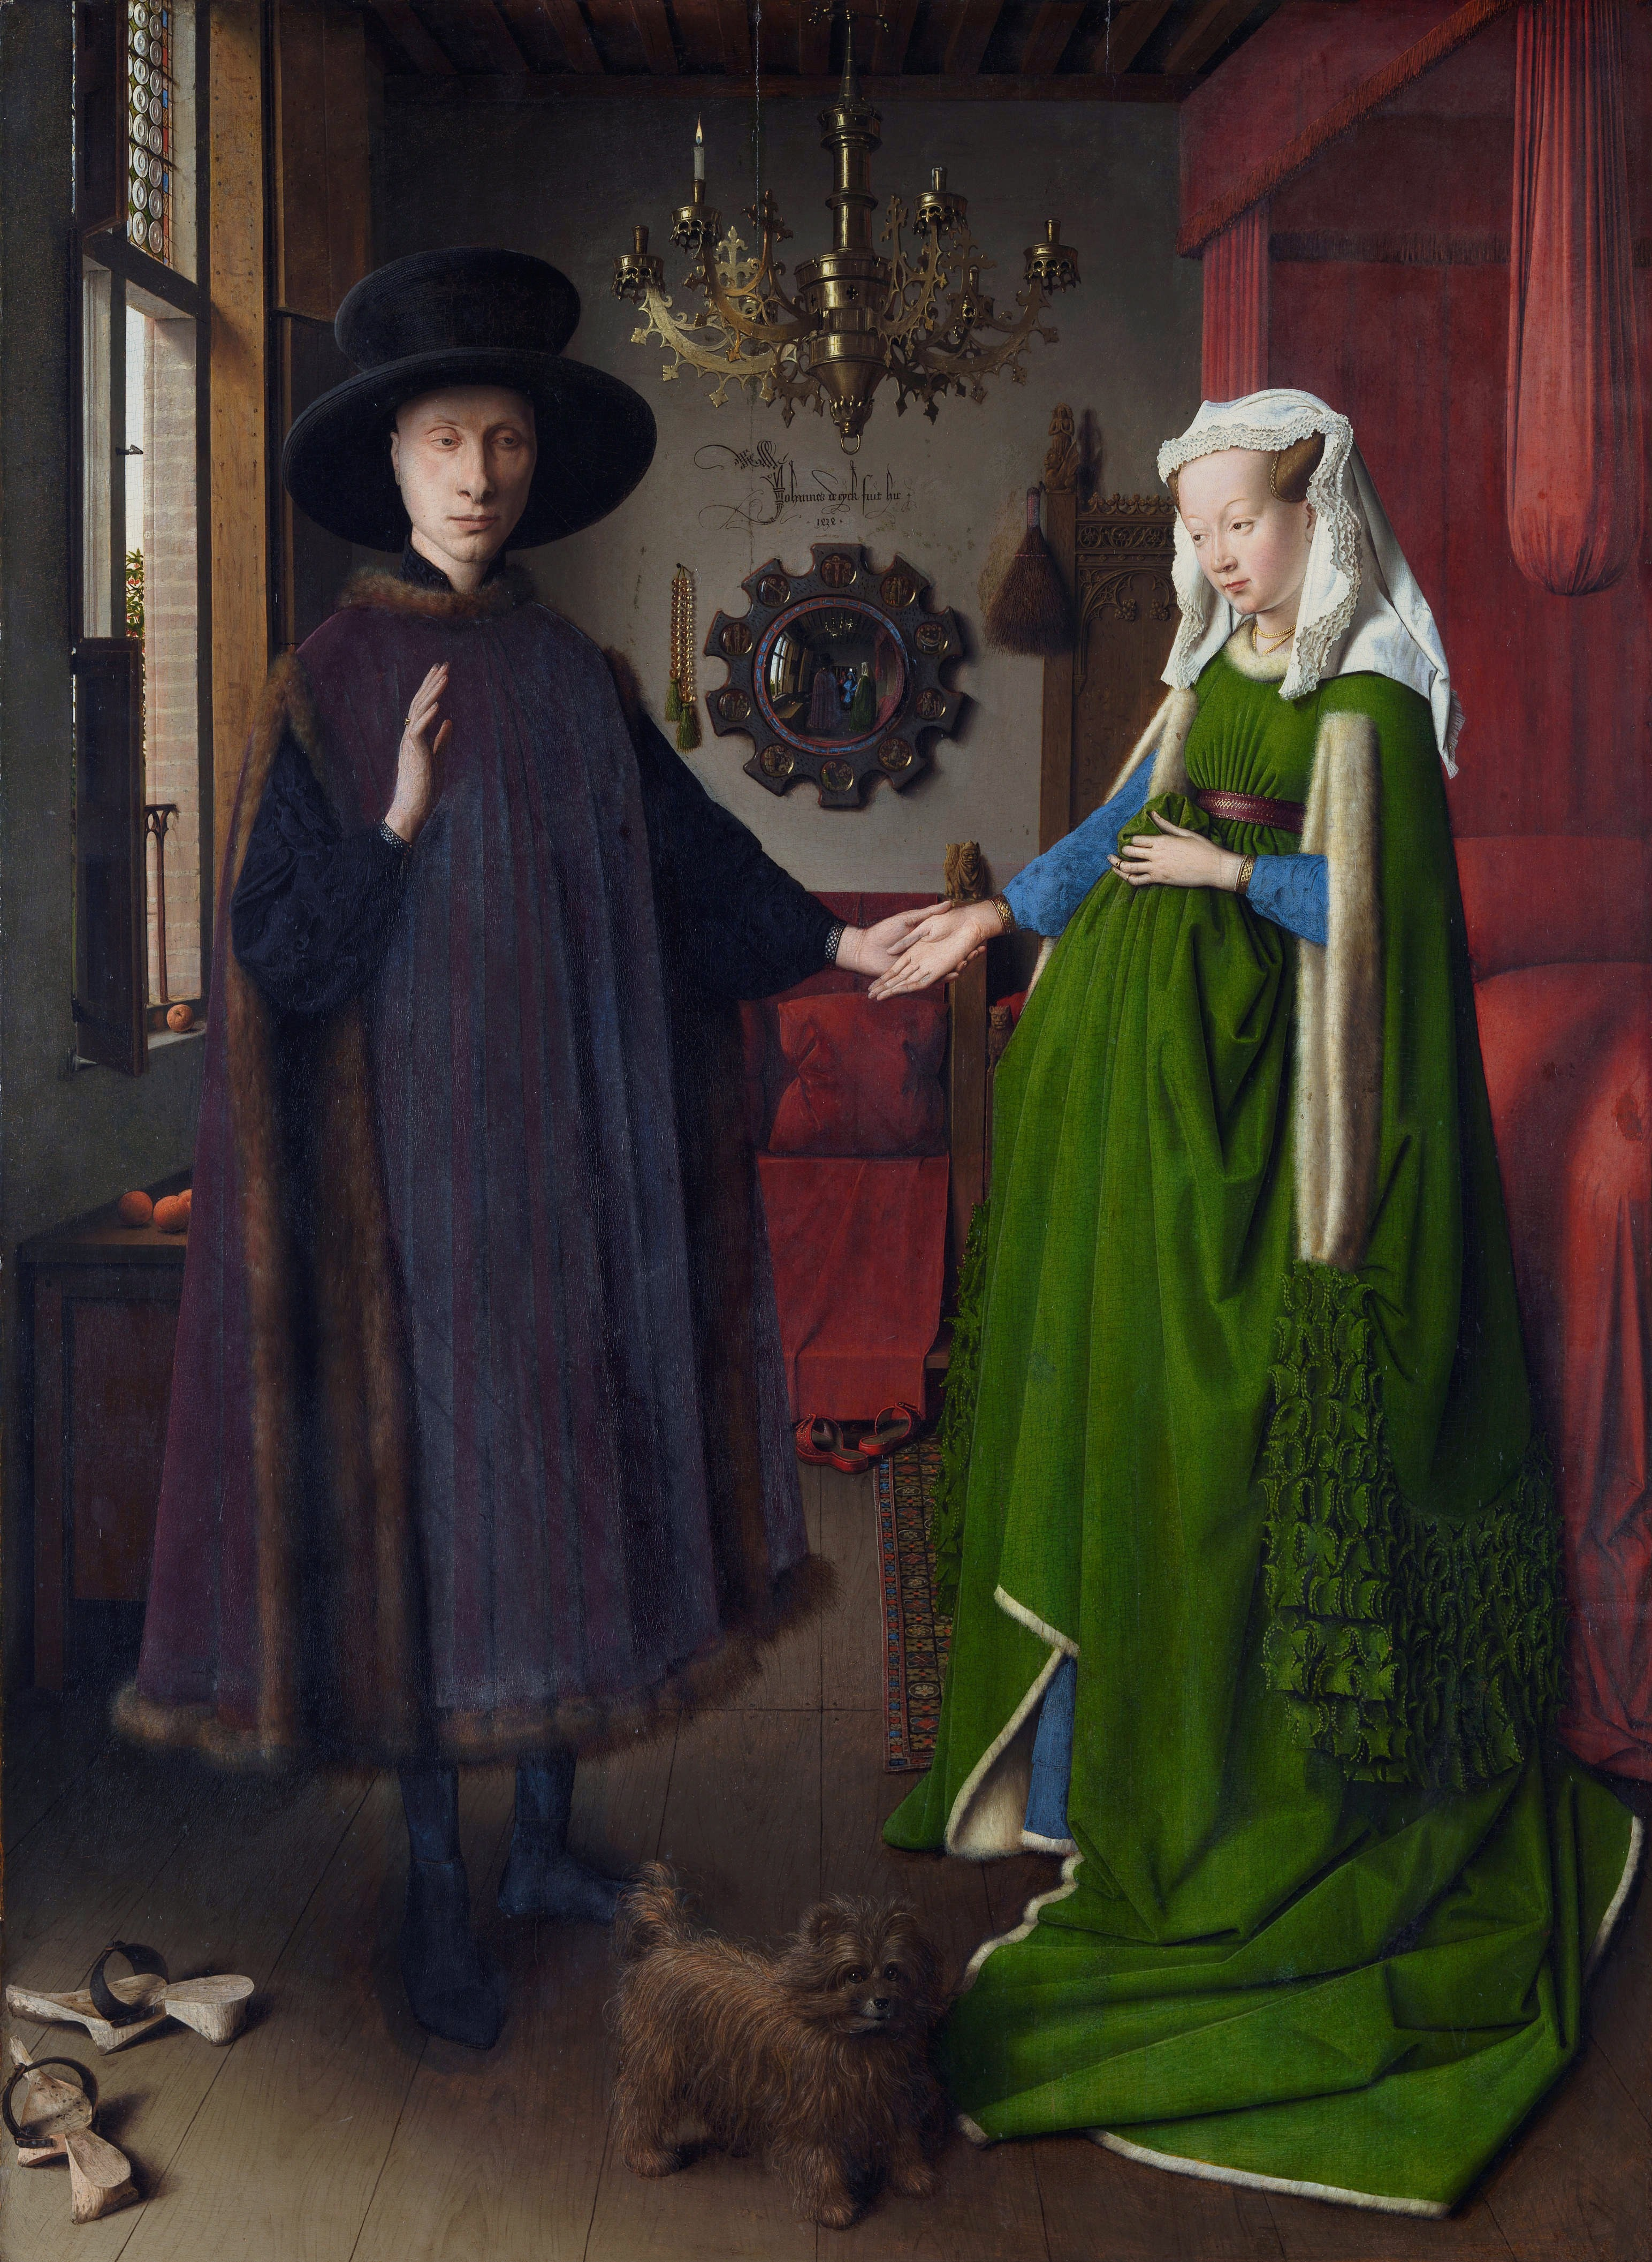 Arnolfini Portrait, 1434, National Gallery, London.